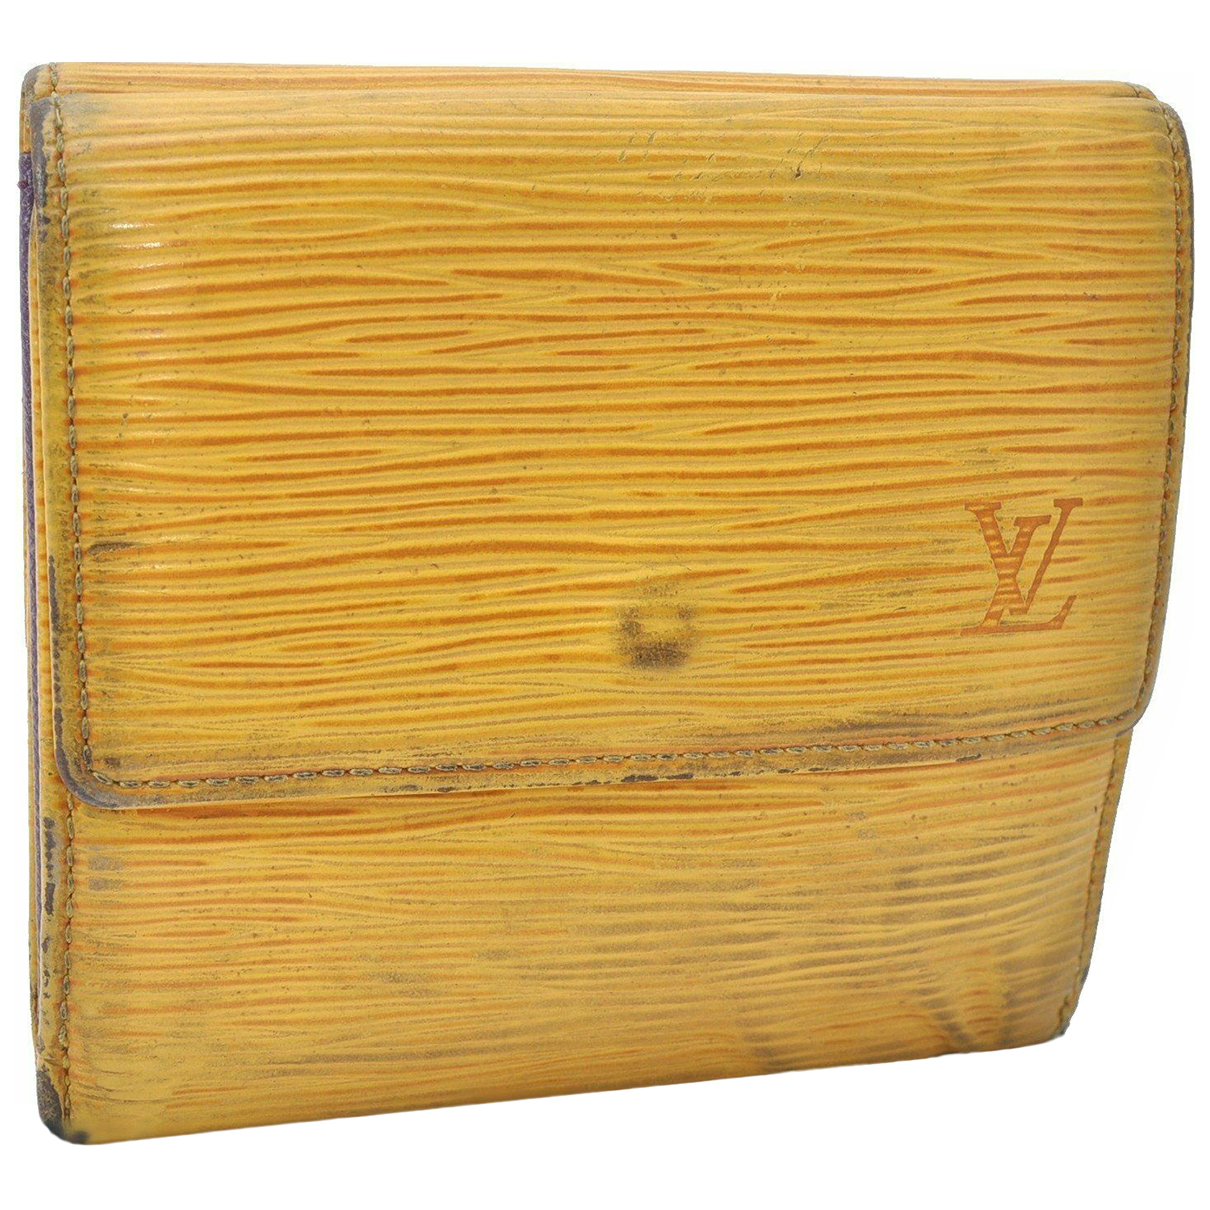 Louis Vuitton \N Portemonnaie in  Gelb Leder